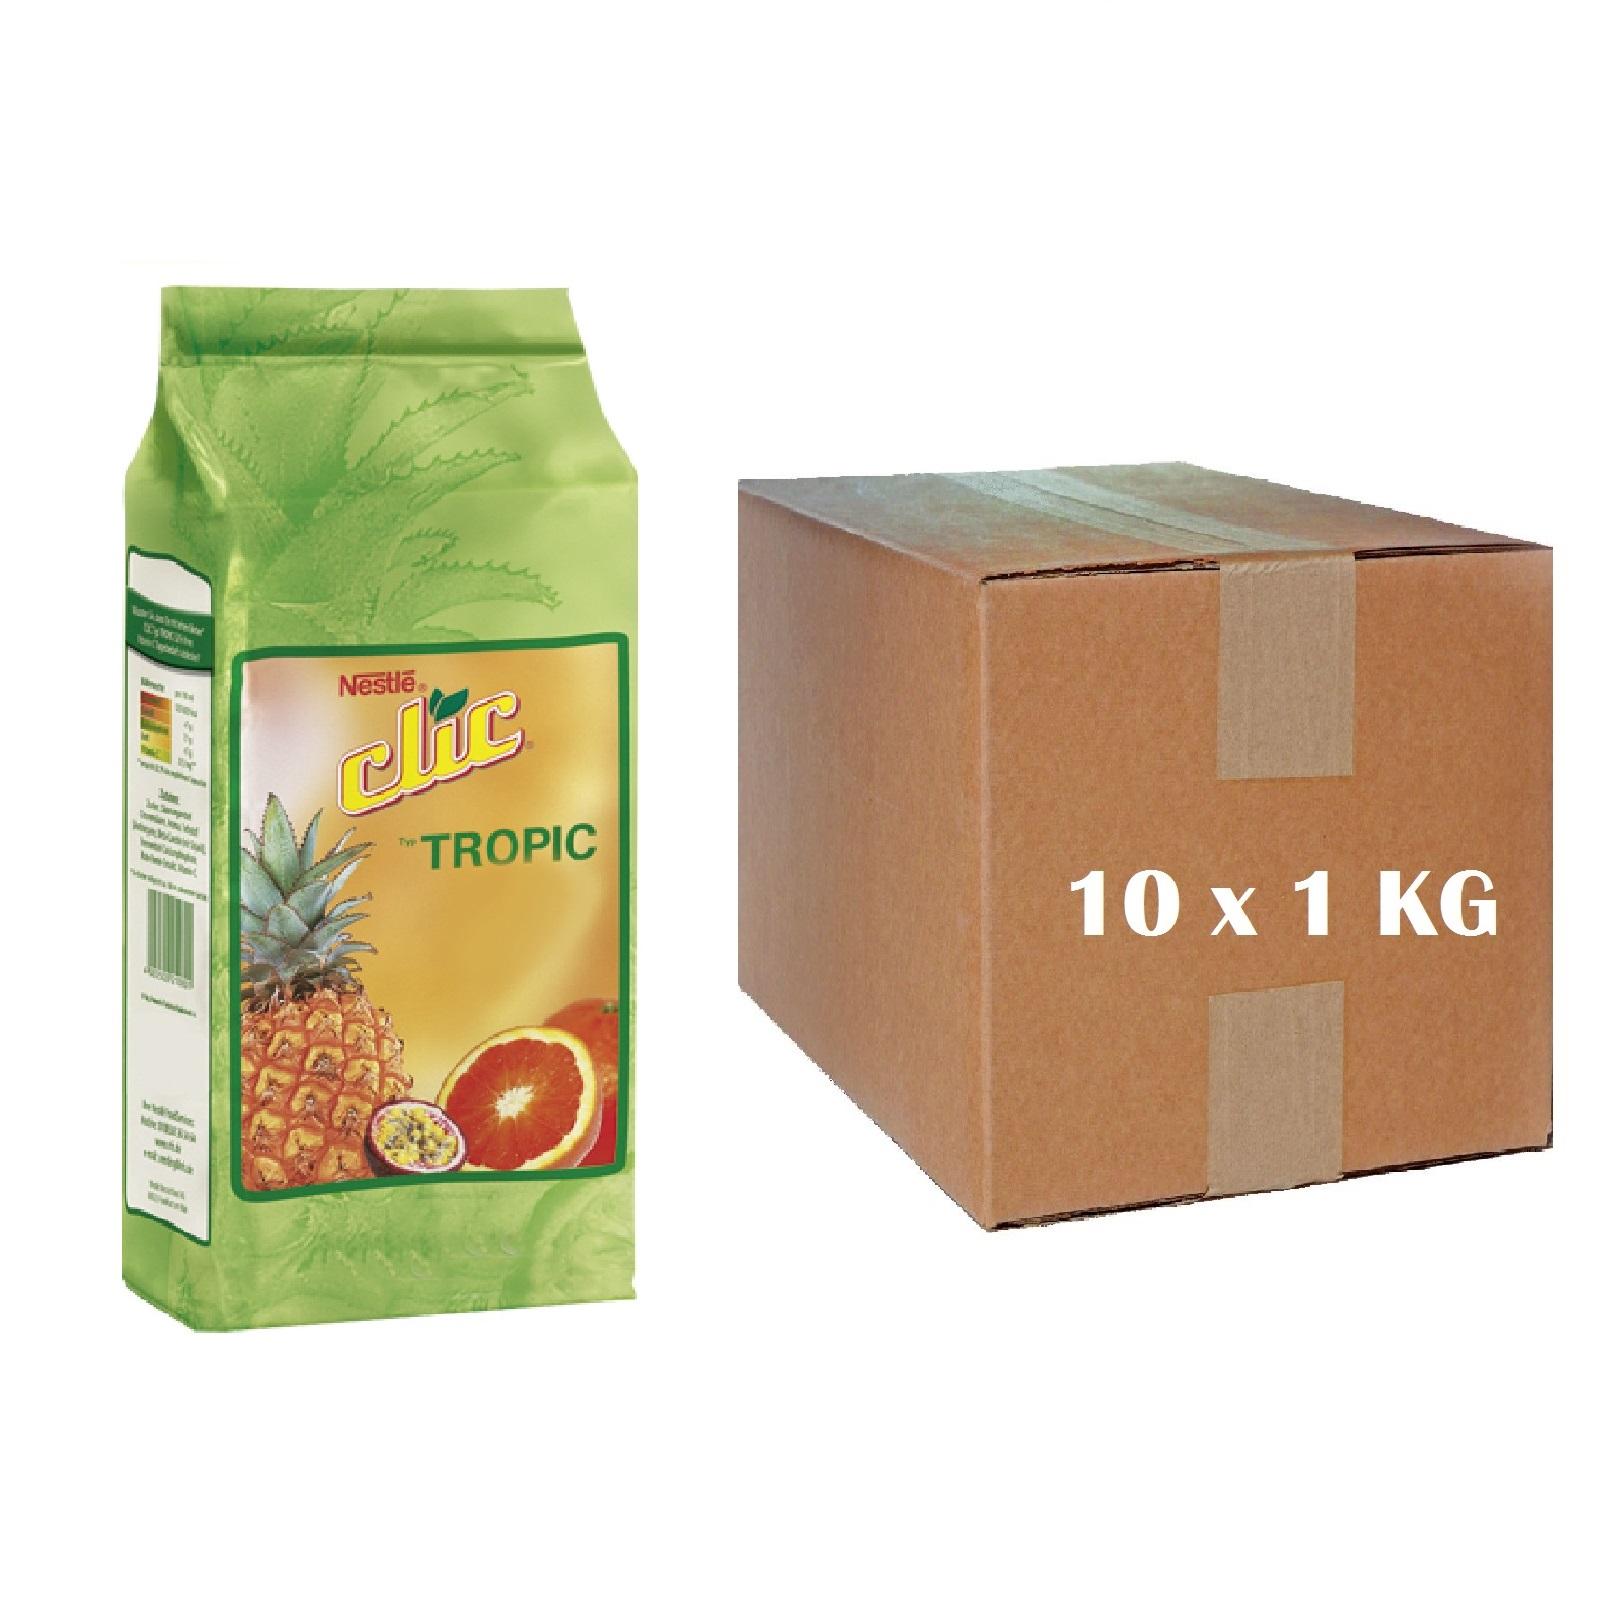 Nestlé Clic Typ Tropic - Karton 10 x 1Kg Instant Tee